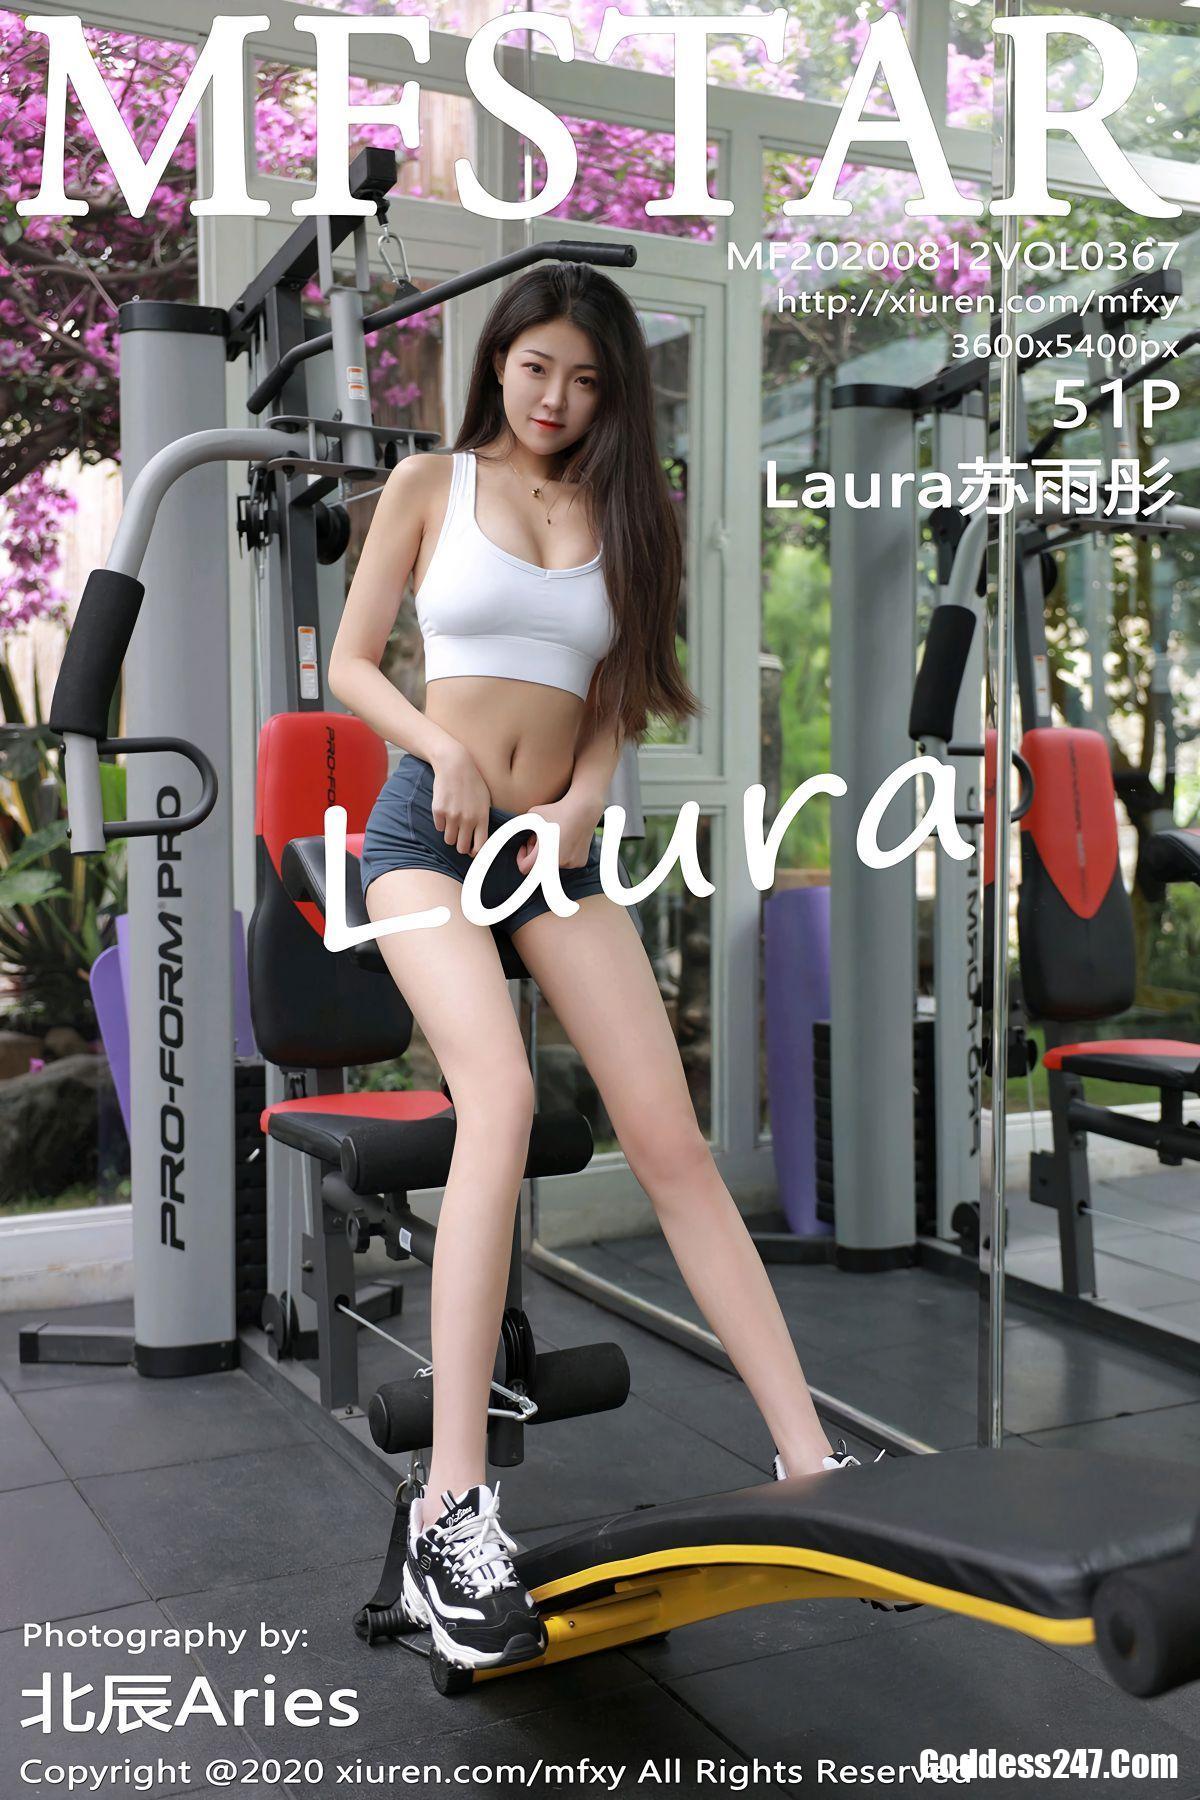 MFStar模范学院 Vol.367 Laura苏雨彤